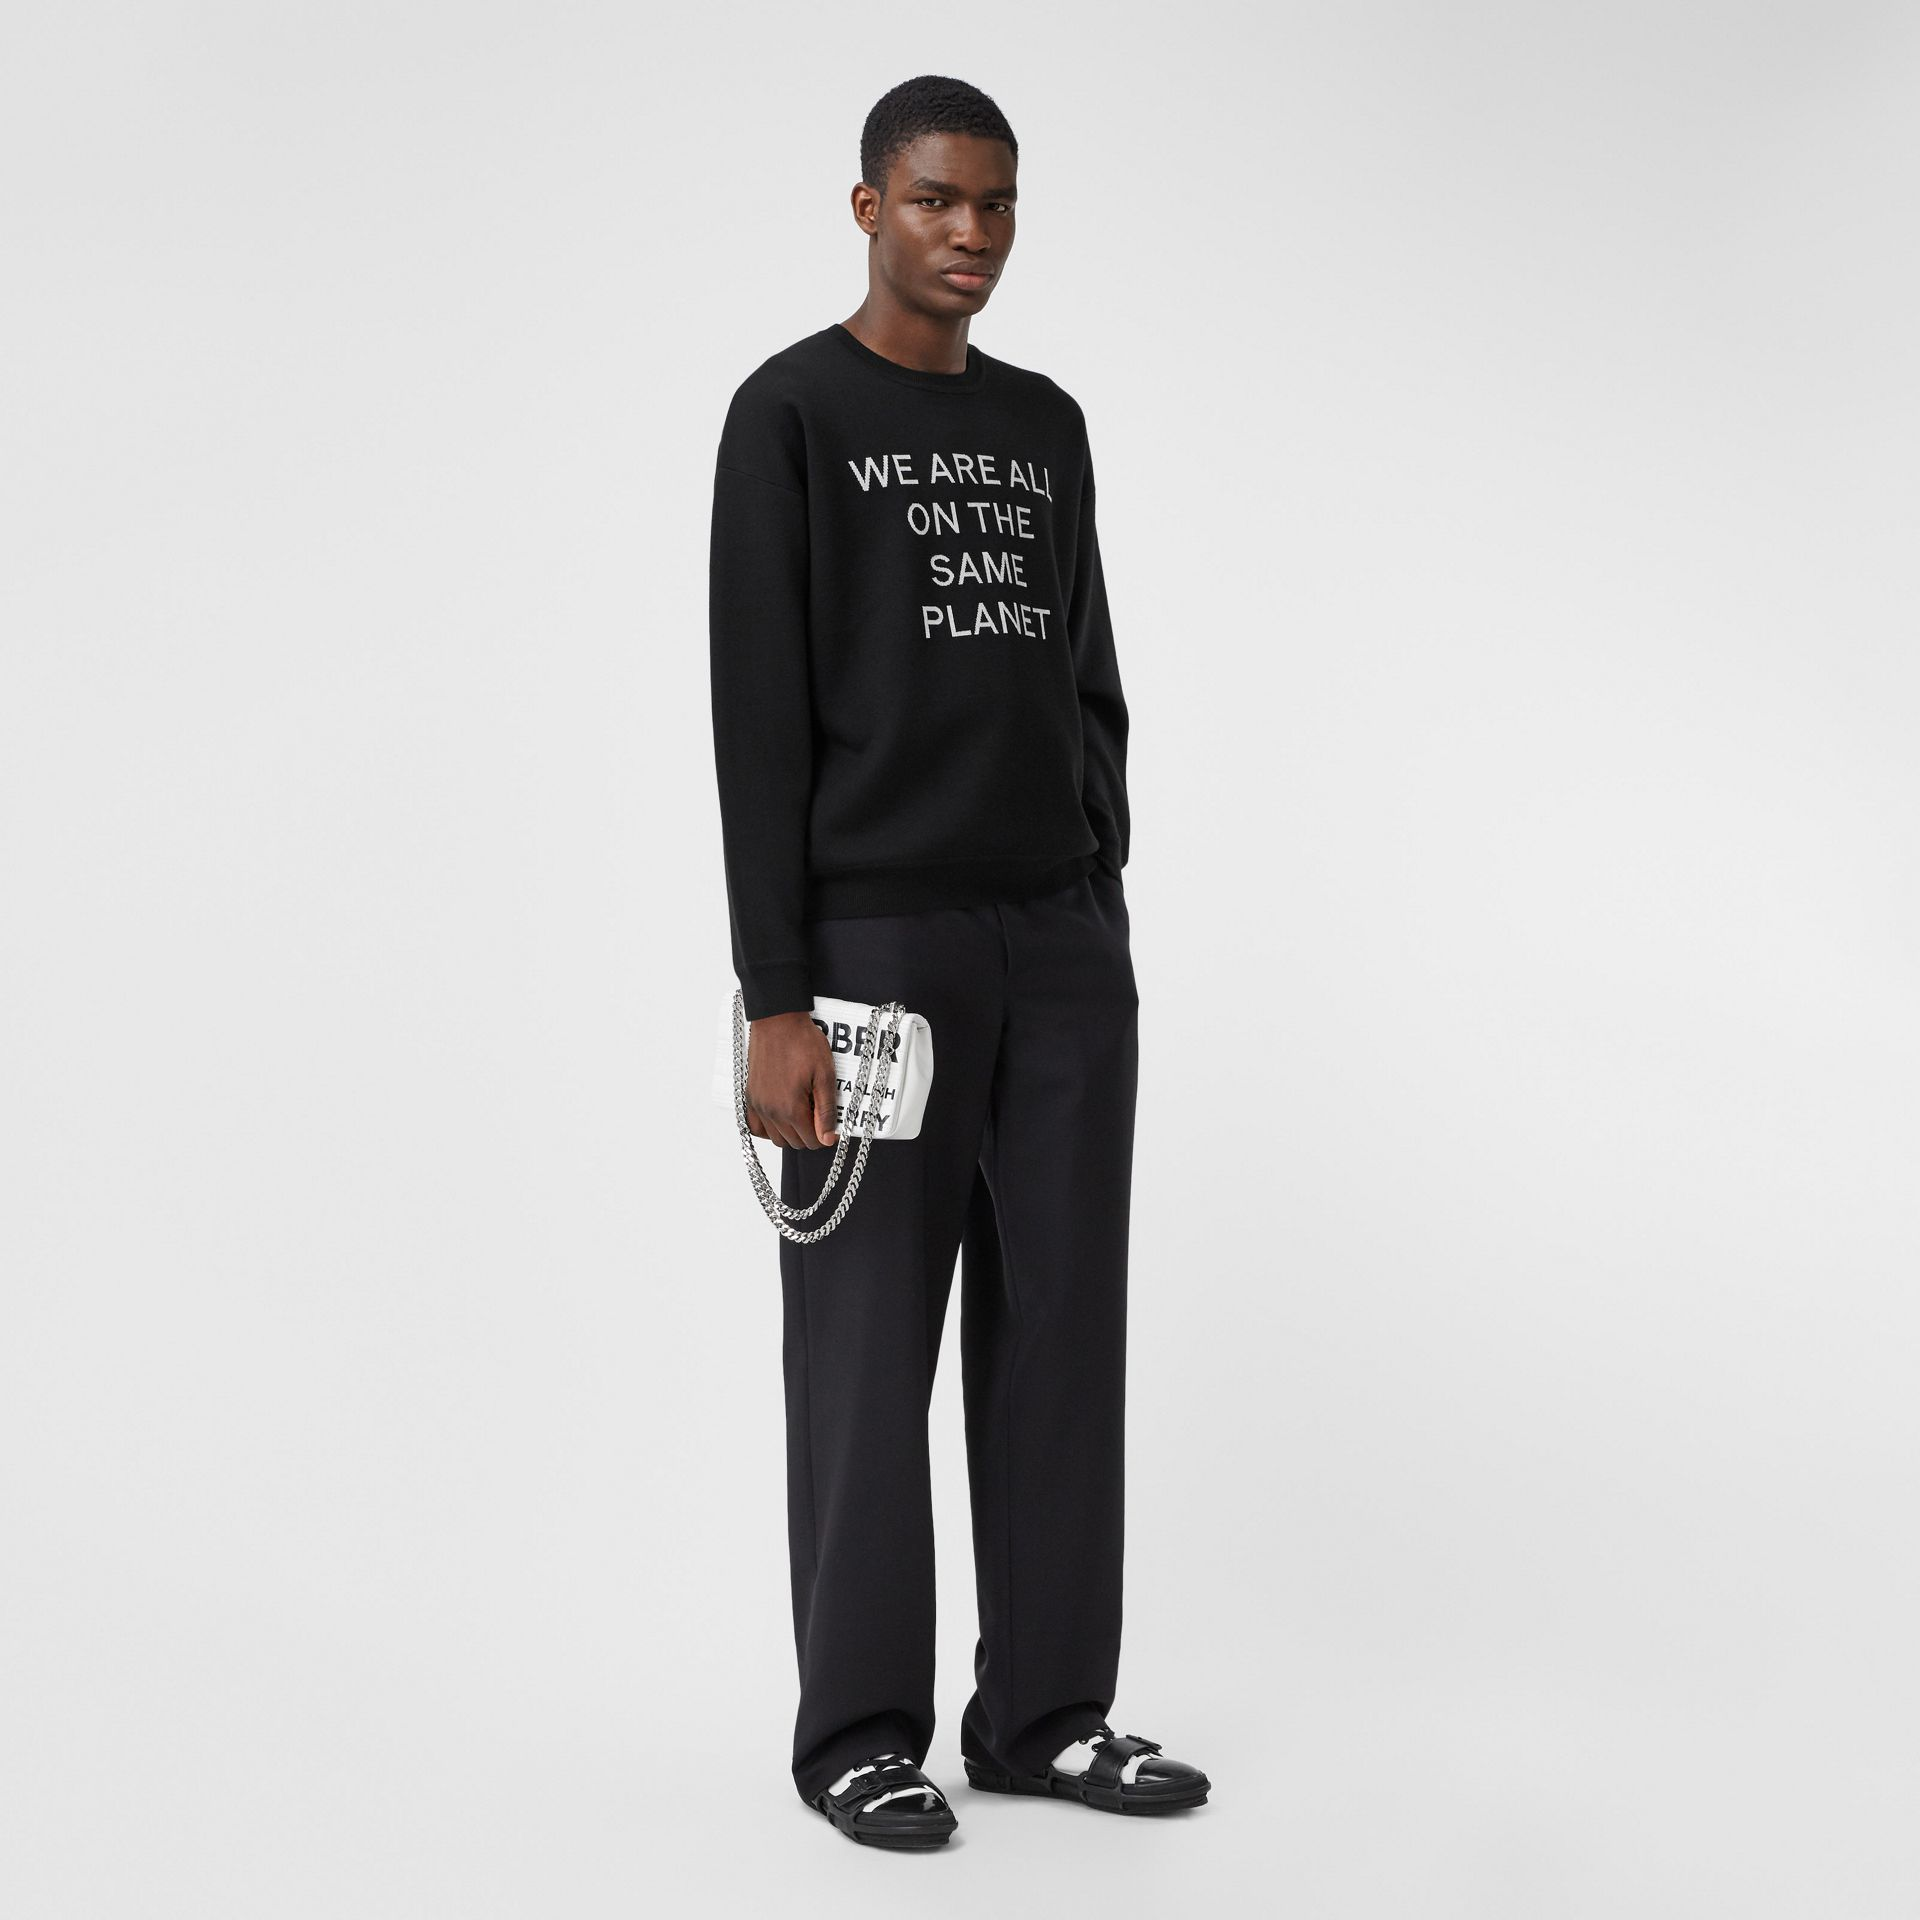 Slogan Intarsia Merino Wool Blend Sweater in Black - Men | Burberry United States - gallery image 4